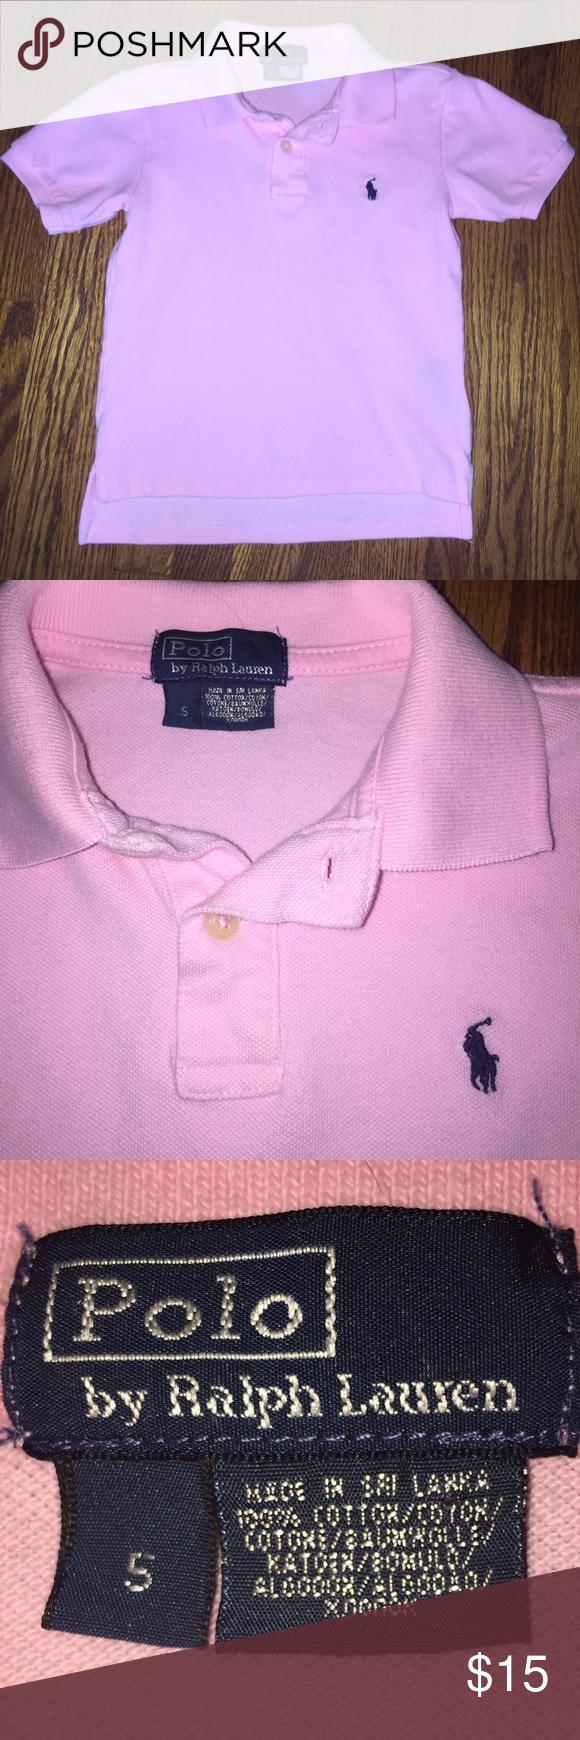 Boys' Polo by Ralph Lauren polo shirt...Size 5 Boys' pink polo shirt by Polo by Ralph Lauren...Size 5...in excellent condition from a smoke free home! Polo by Ralph Lauren Shirts & Tops Polos